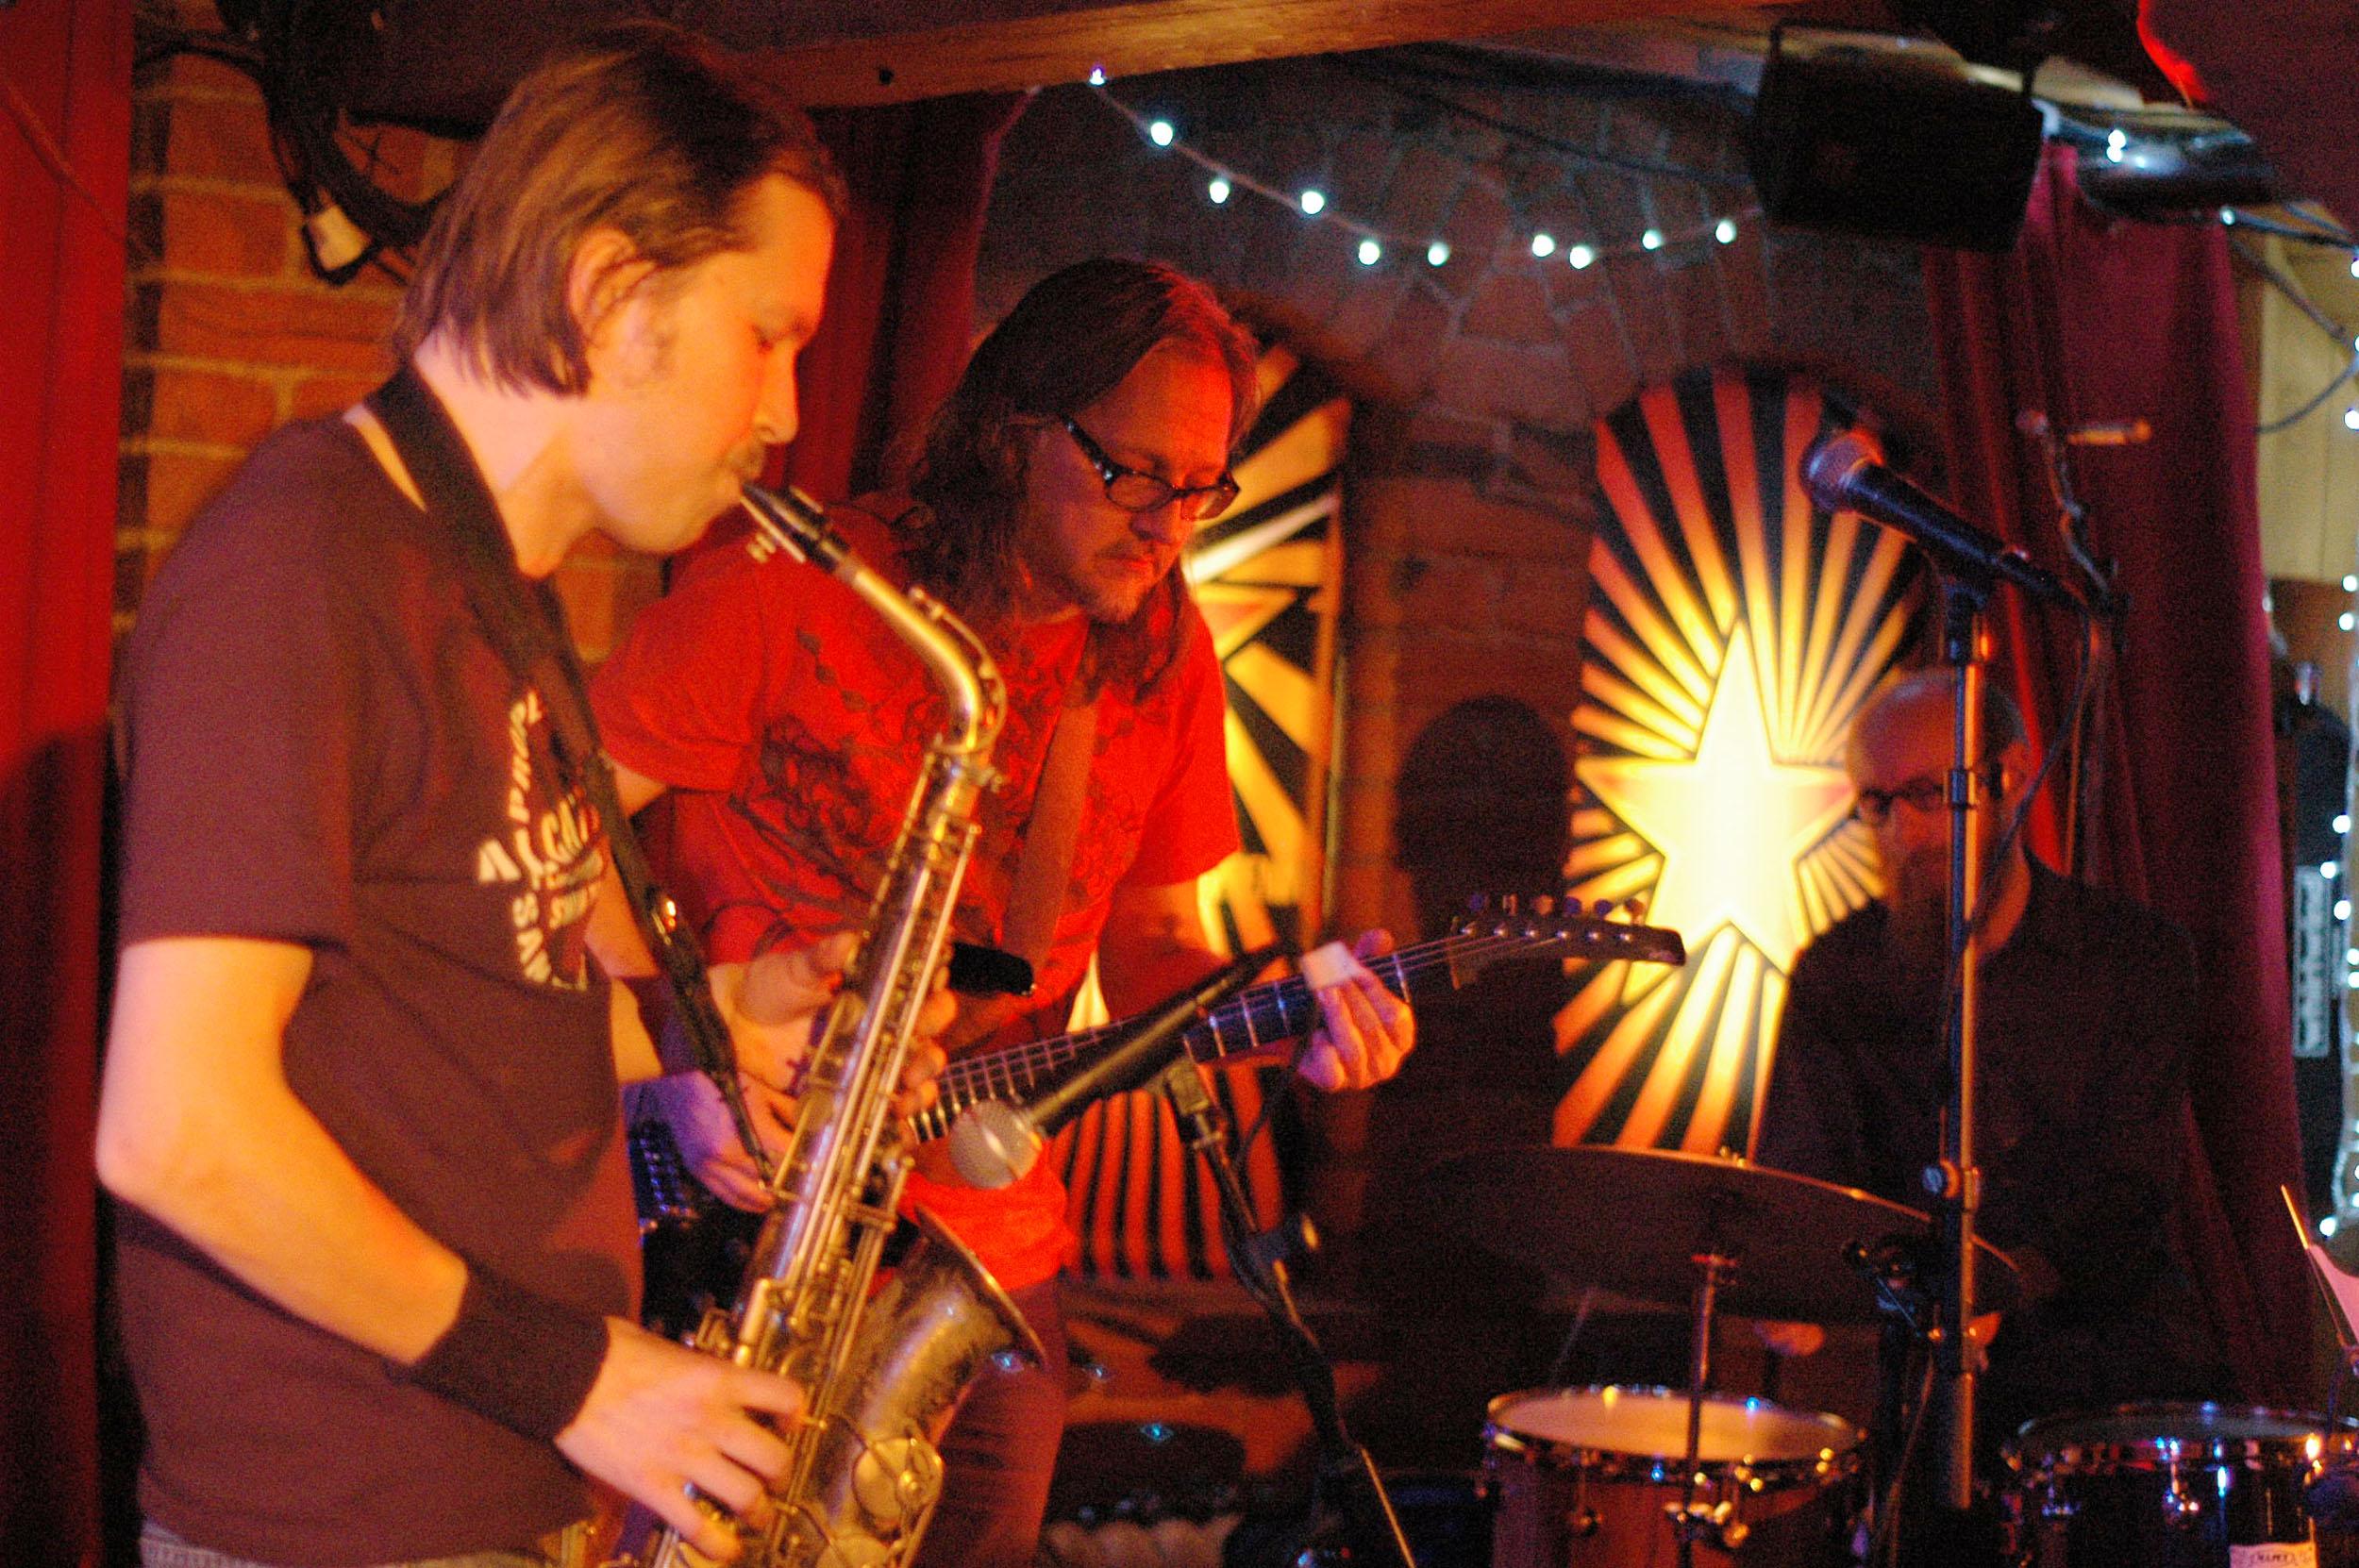 Markus Holkko Quartet at Tampere Jazz Happening 2010